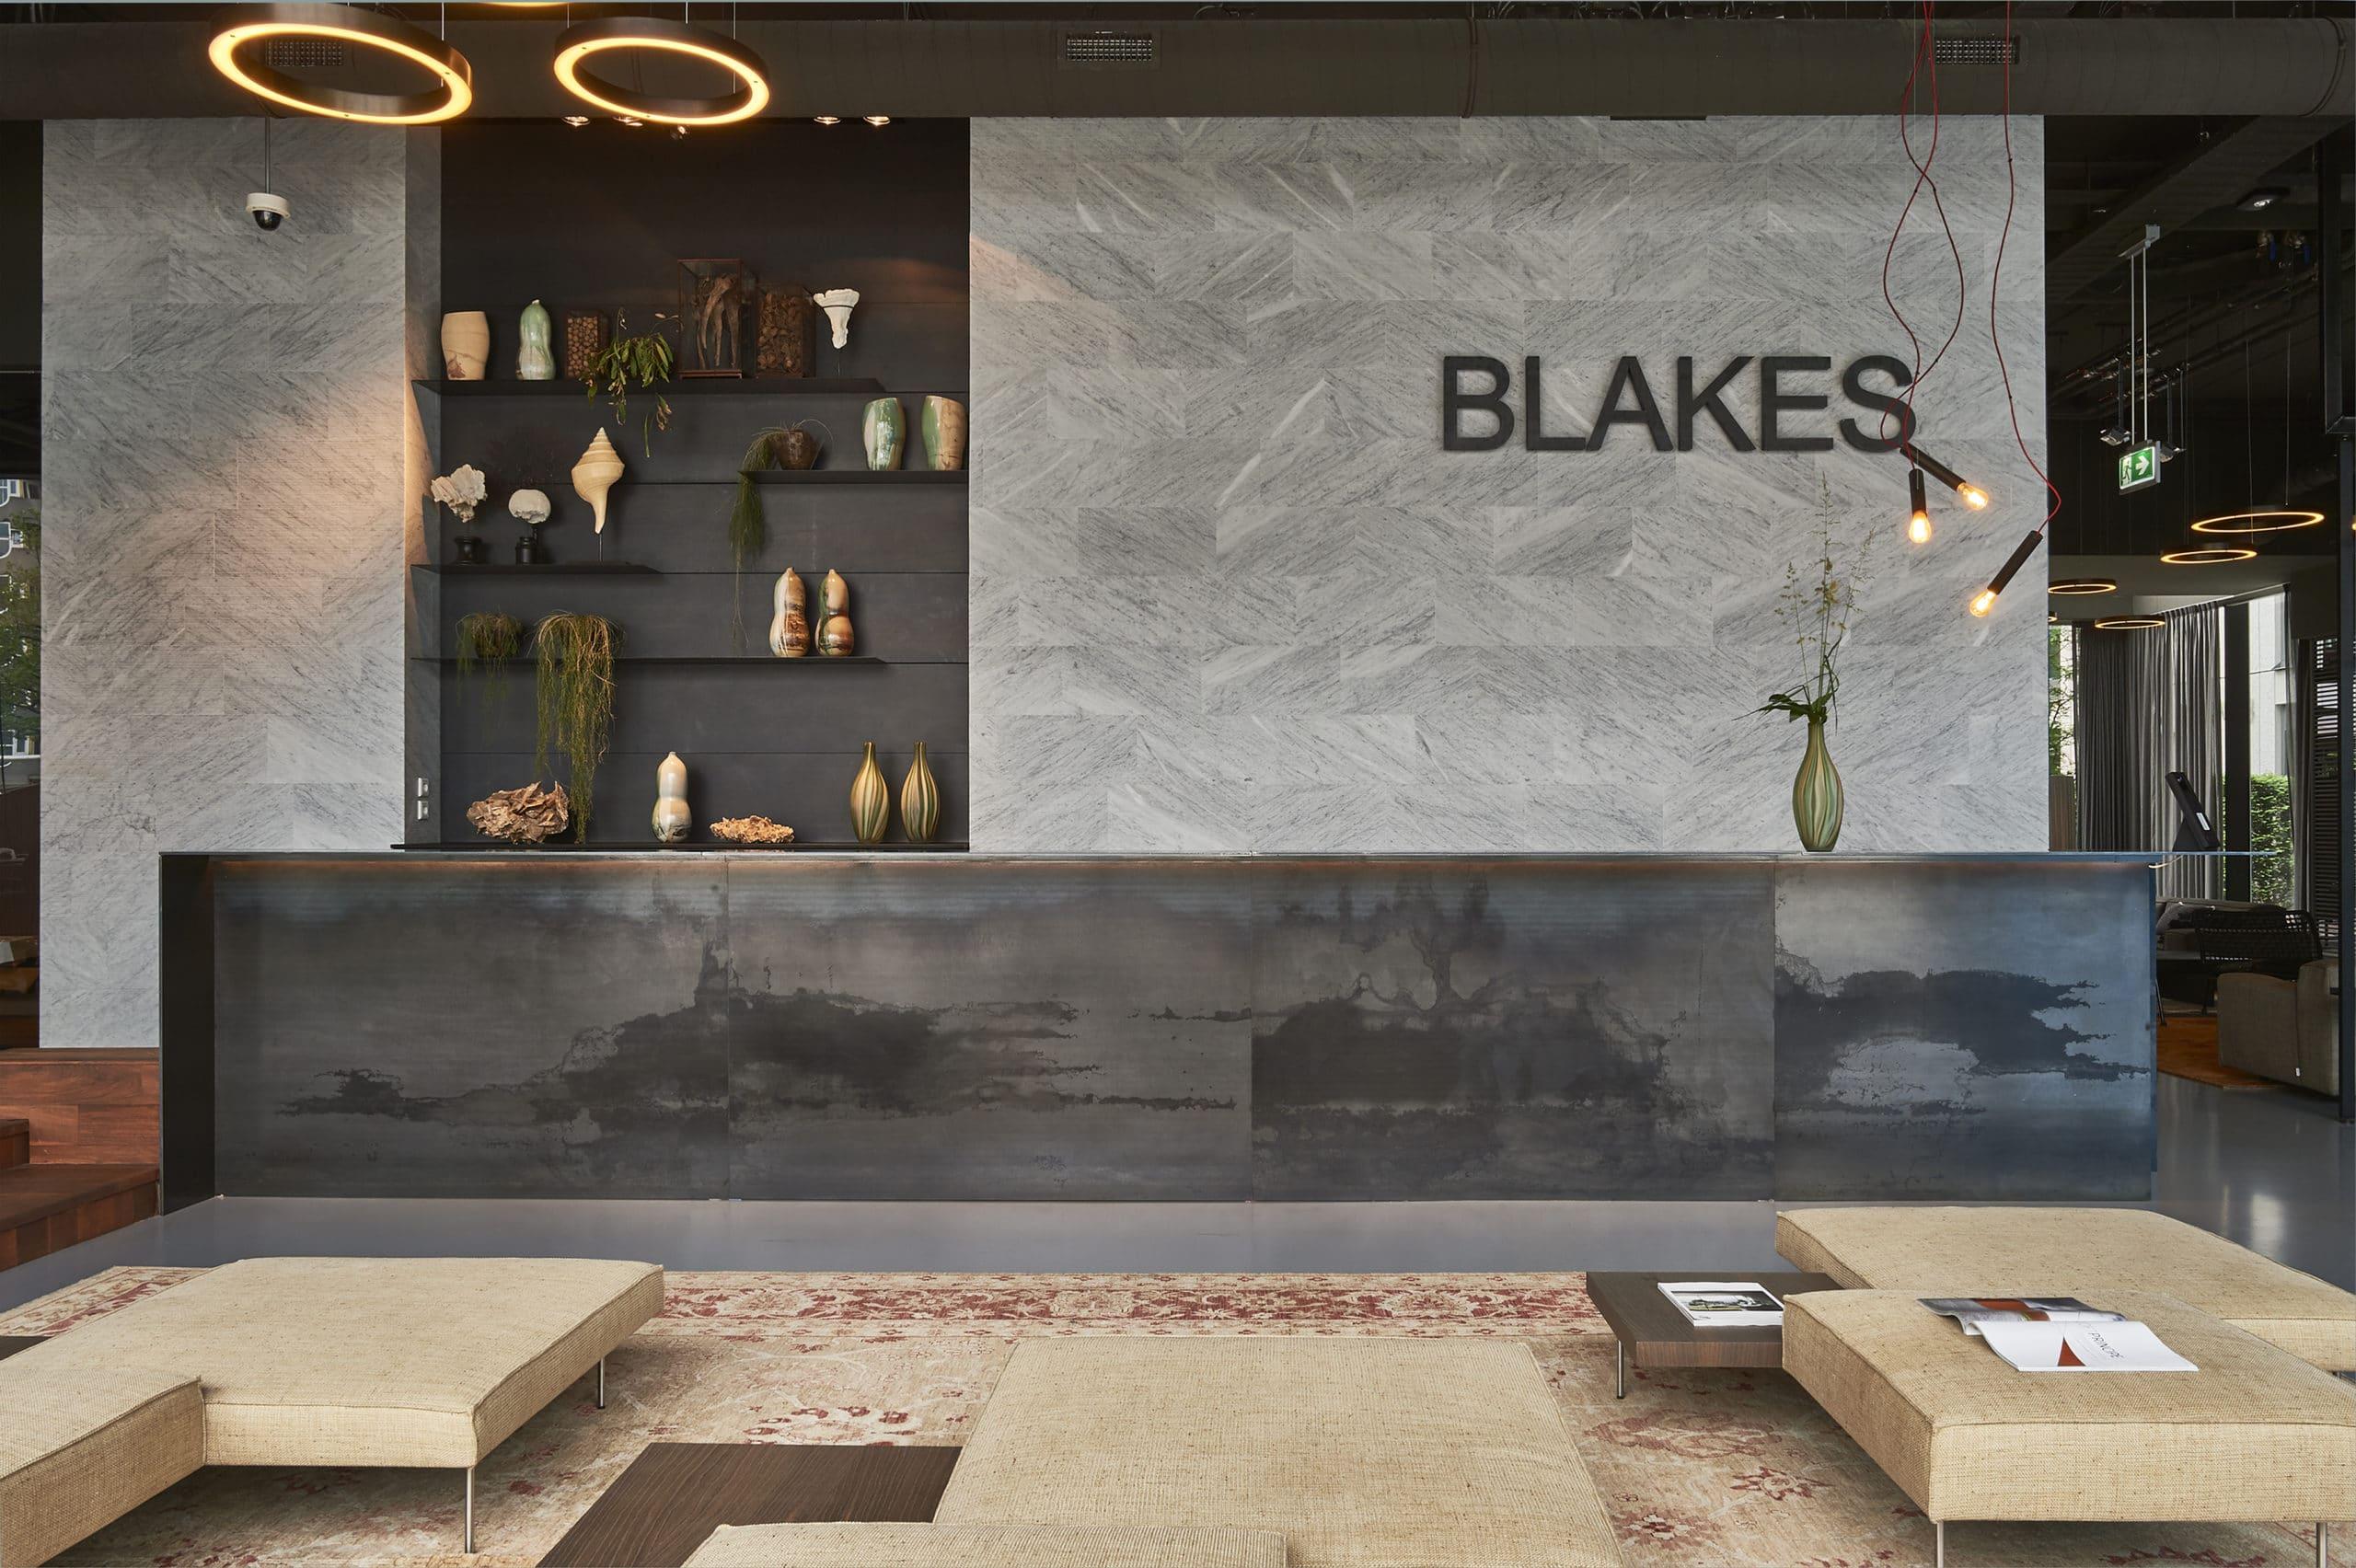 Blakes Lounge reception area